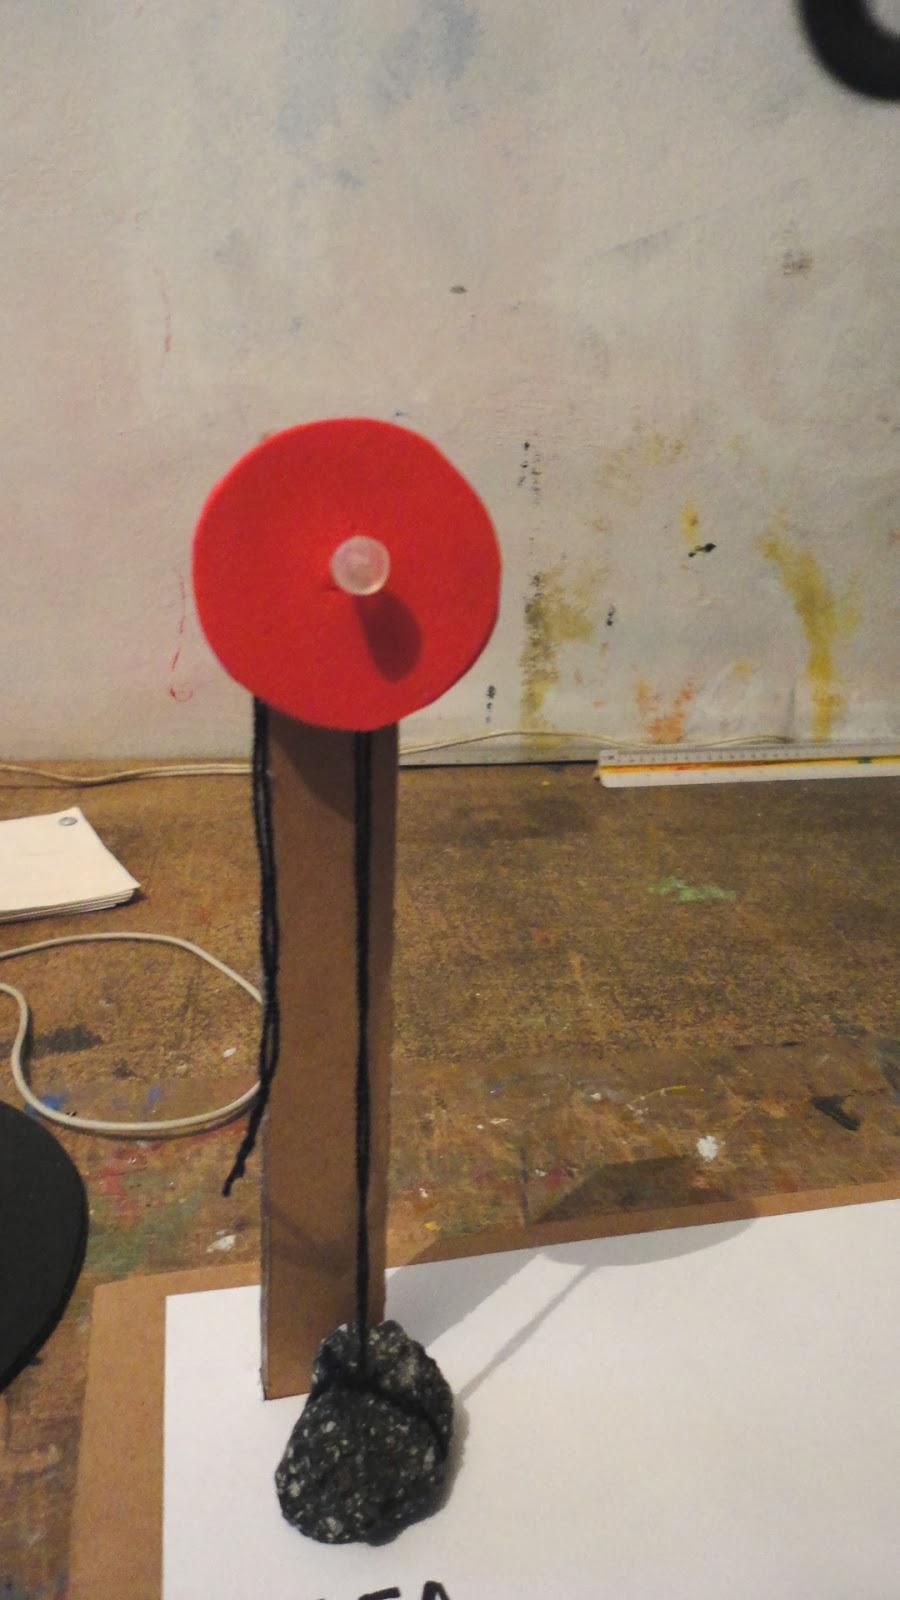 Maquetas dibujos y dise os maquinas simples for Como construir pileta de material